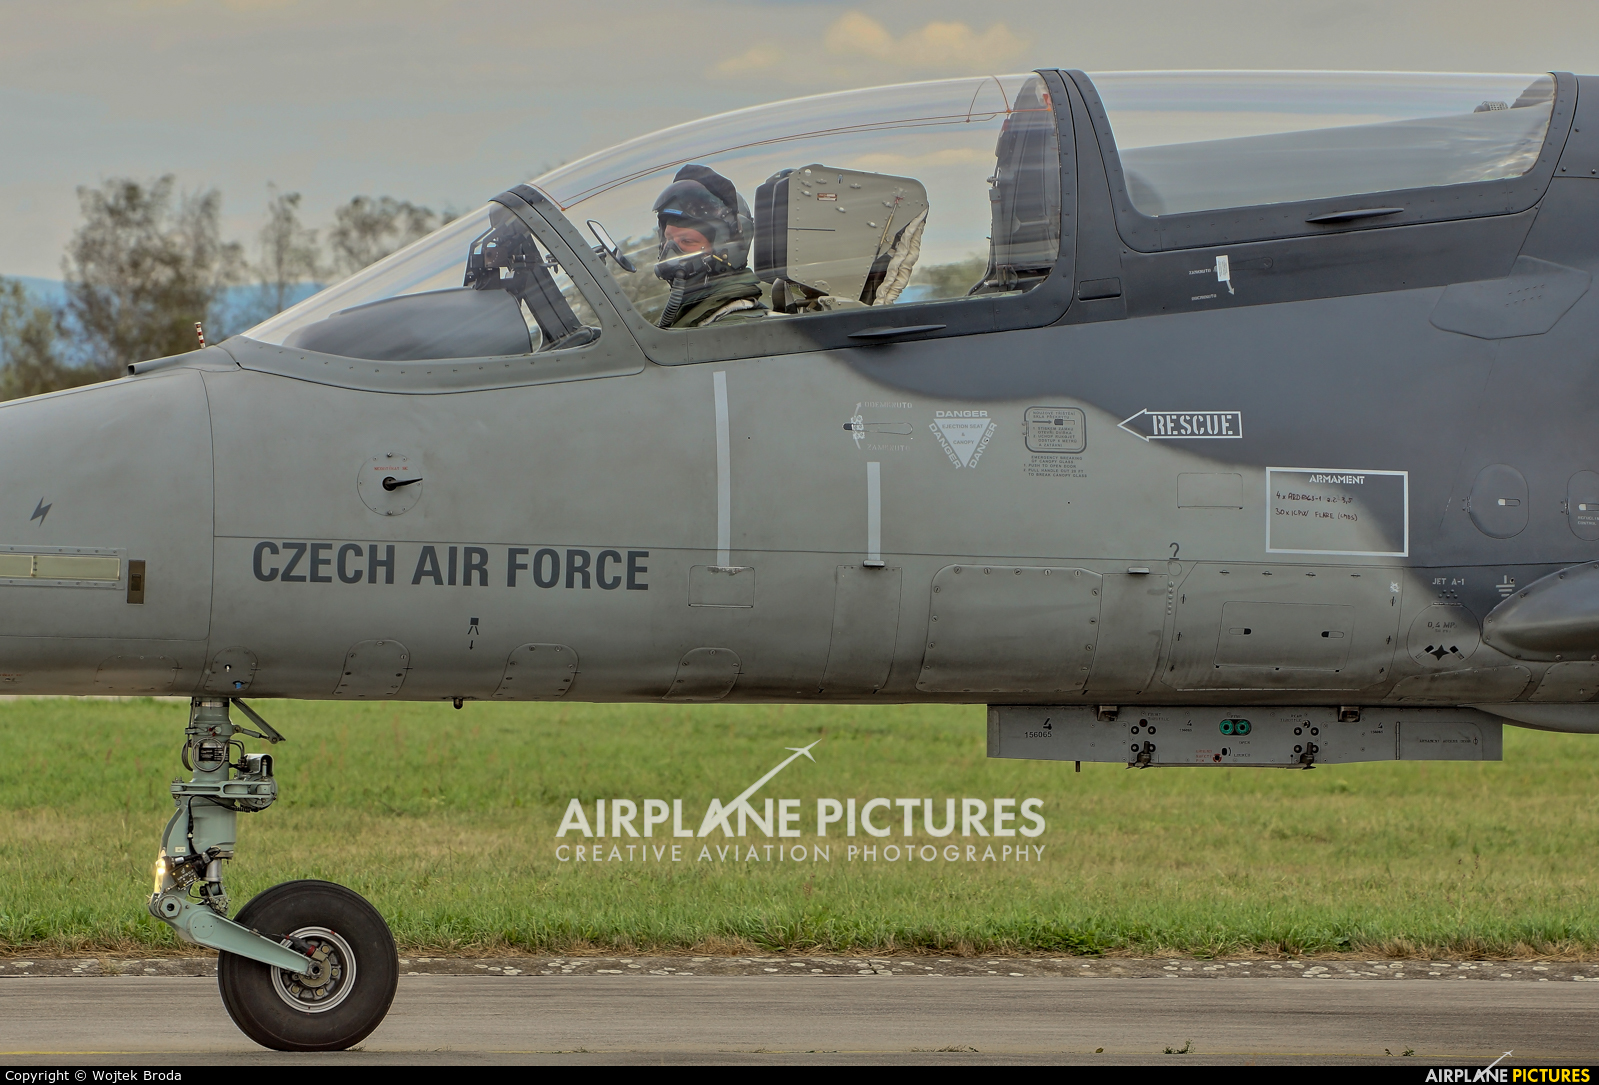 Czech - Air Force 6065 aircraft at Hradec Králové